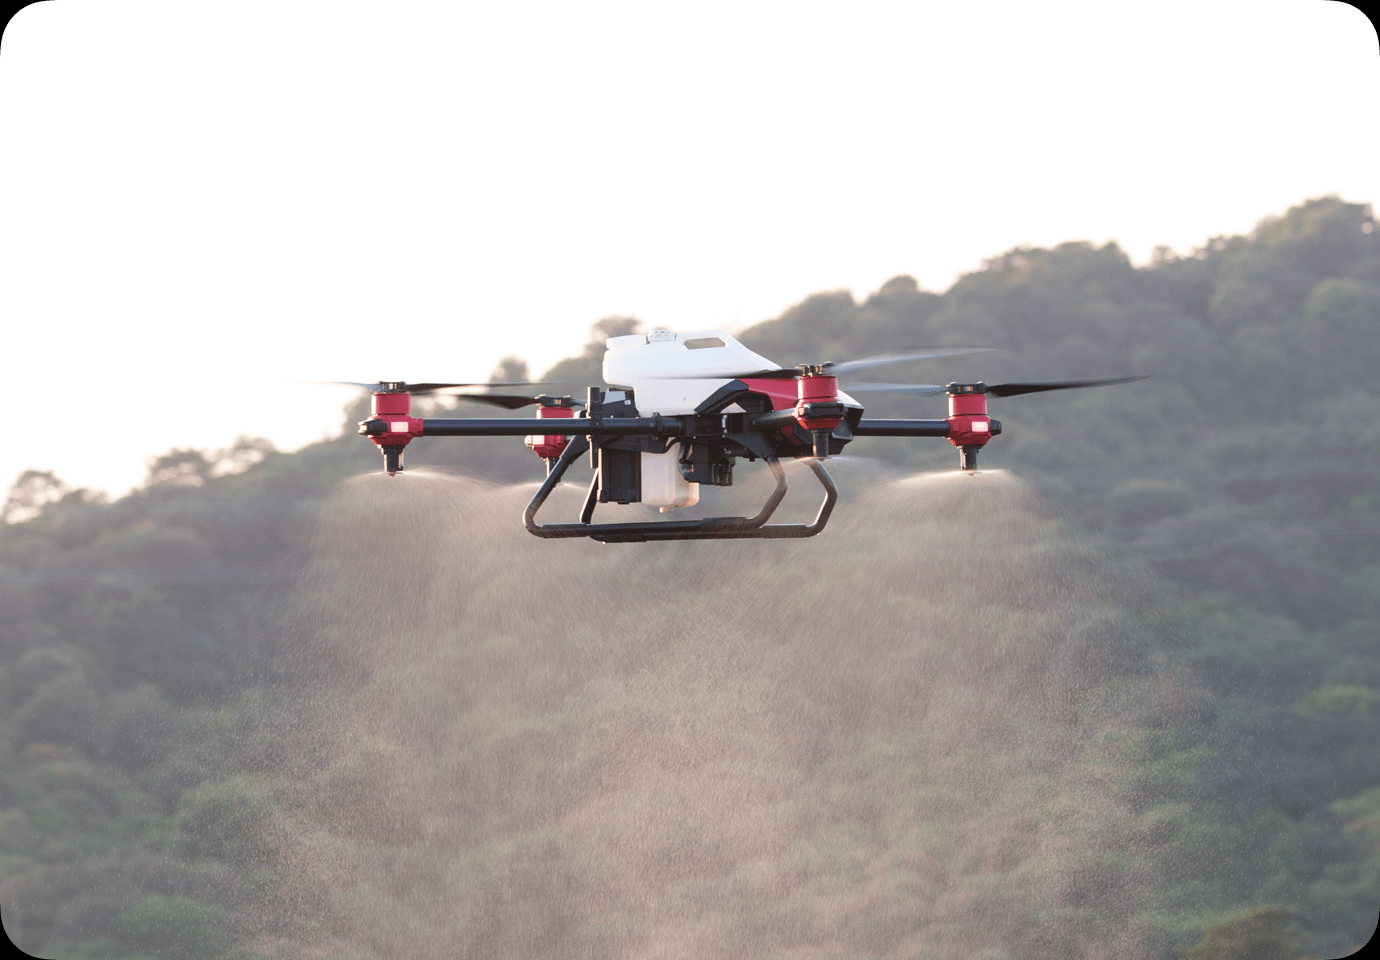 dron_5.png (1013 KB)